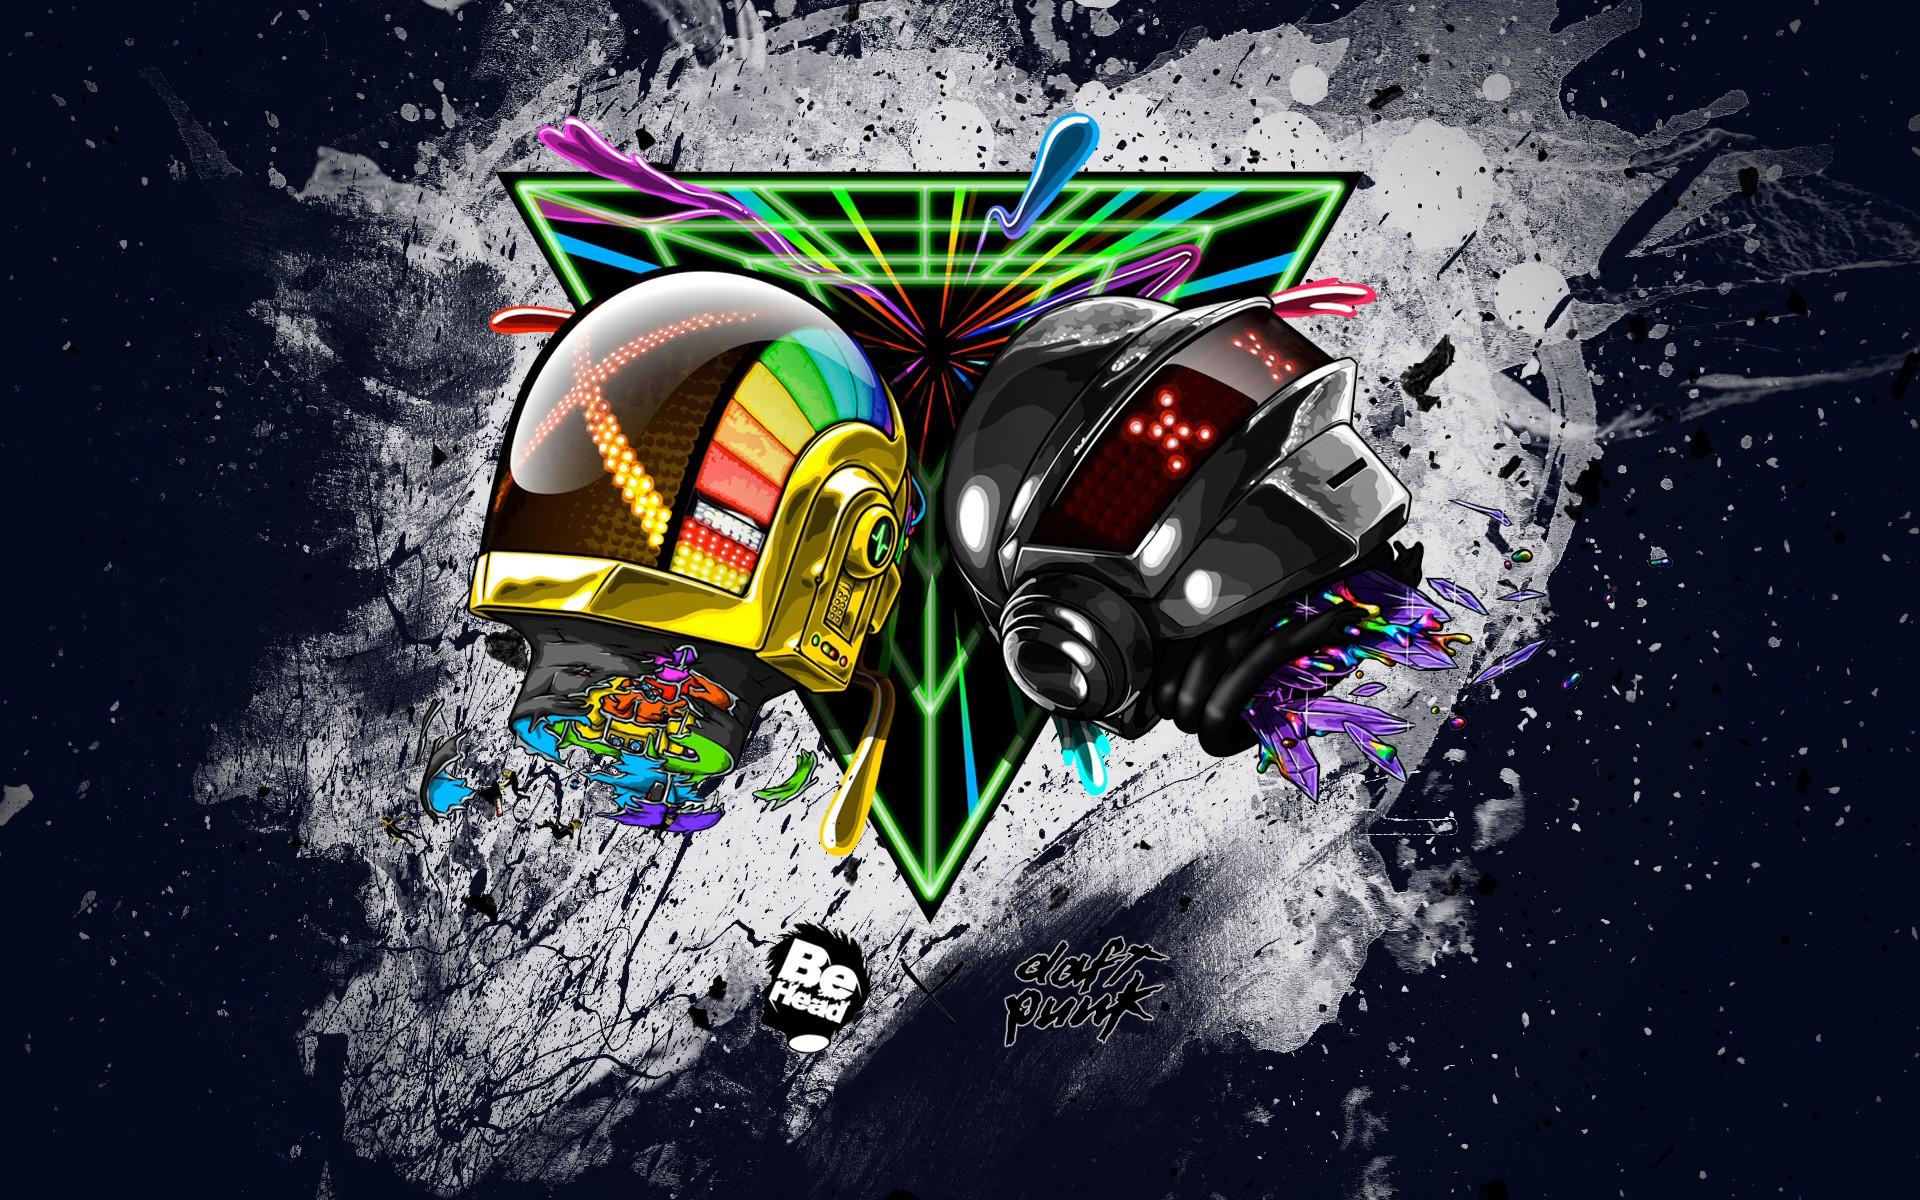 Daft Punk Abstract Wallpaper